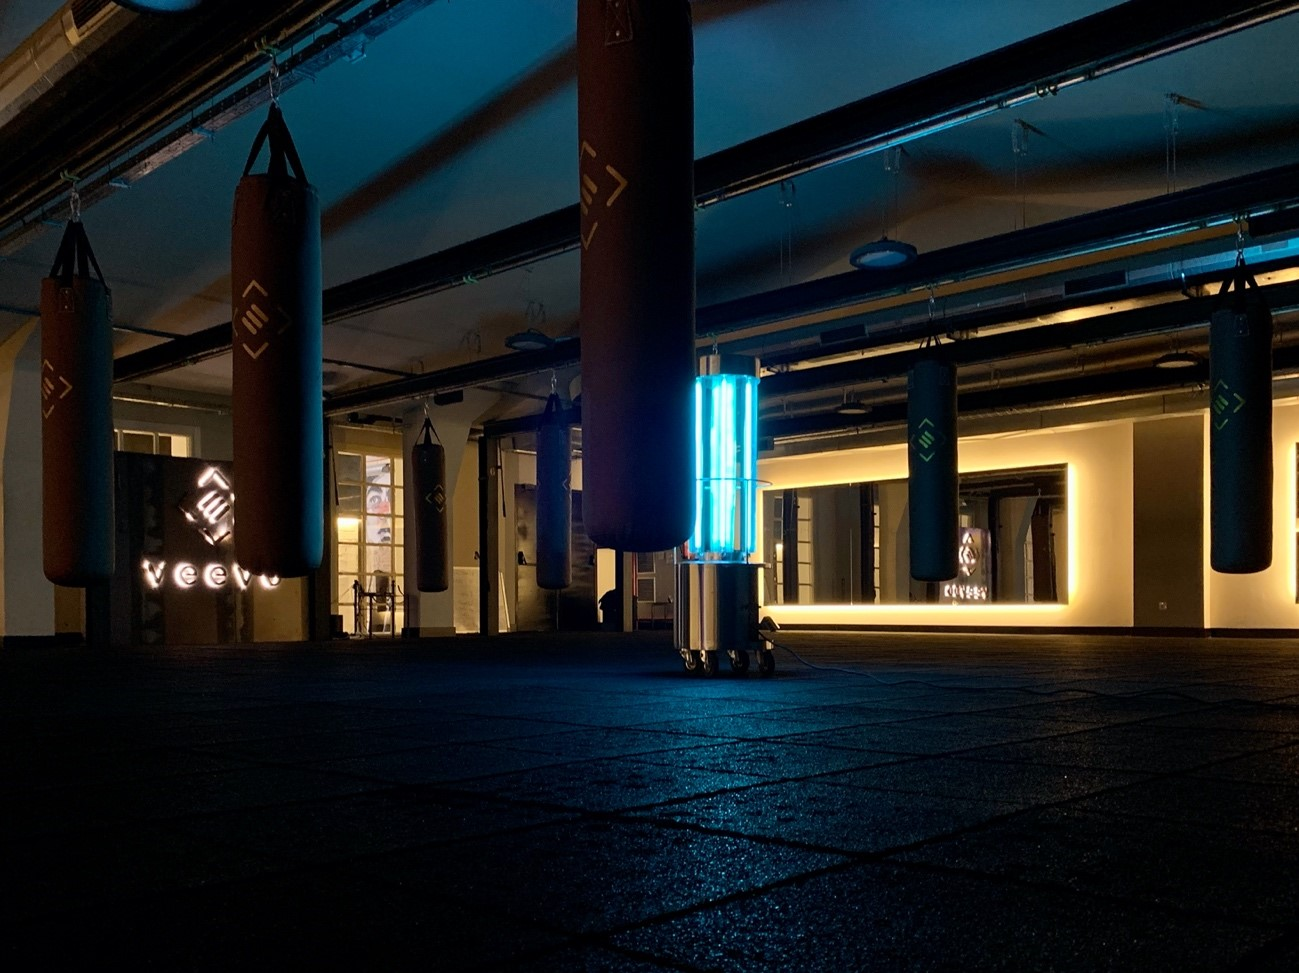 Los centros boutique Veevo aplicarán luz ultravioleta para desinfectar